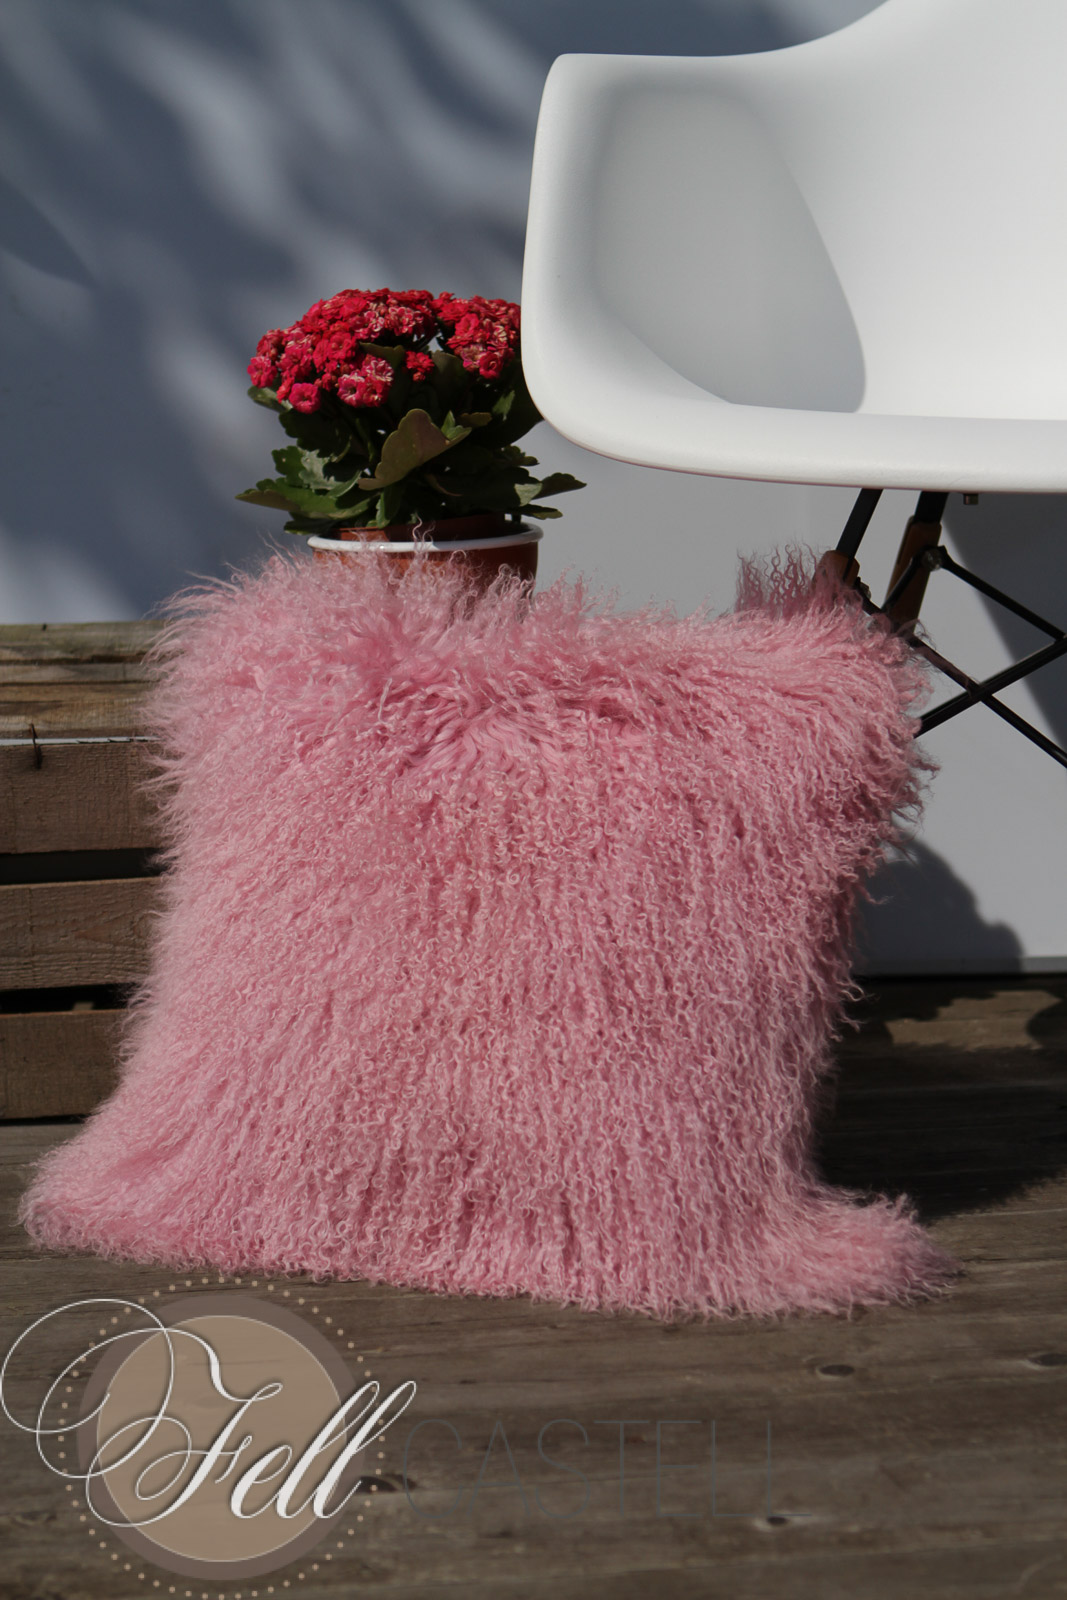 kissen tibet lammfell rose quarz r ckseite aus stoff ca 30 x 30 cm sofakissen lammfell. Black Bedroom Furniture Sets. Home Design Ideas